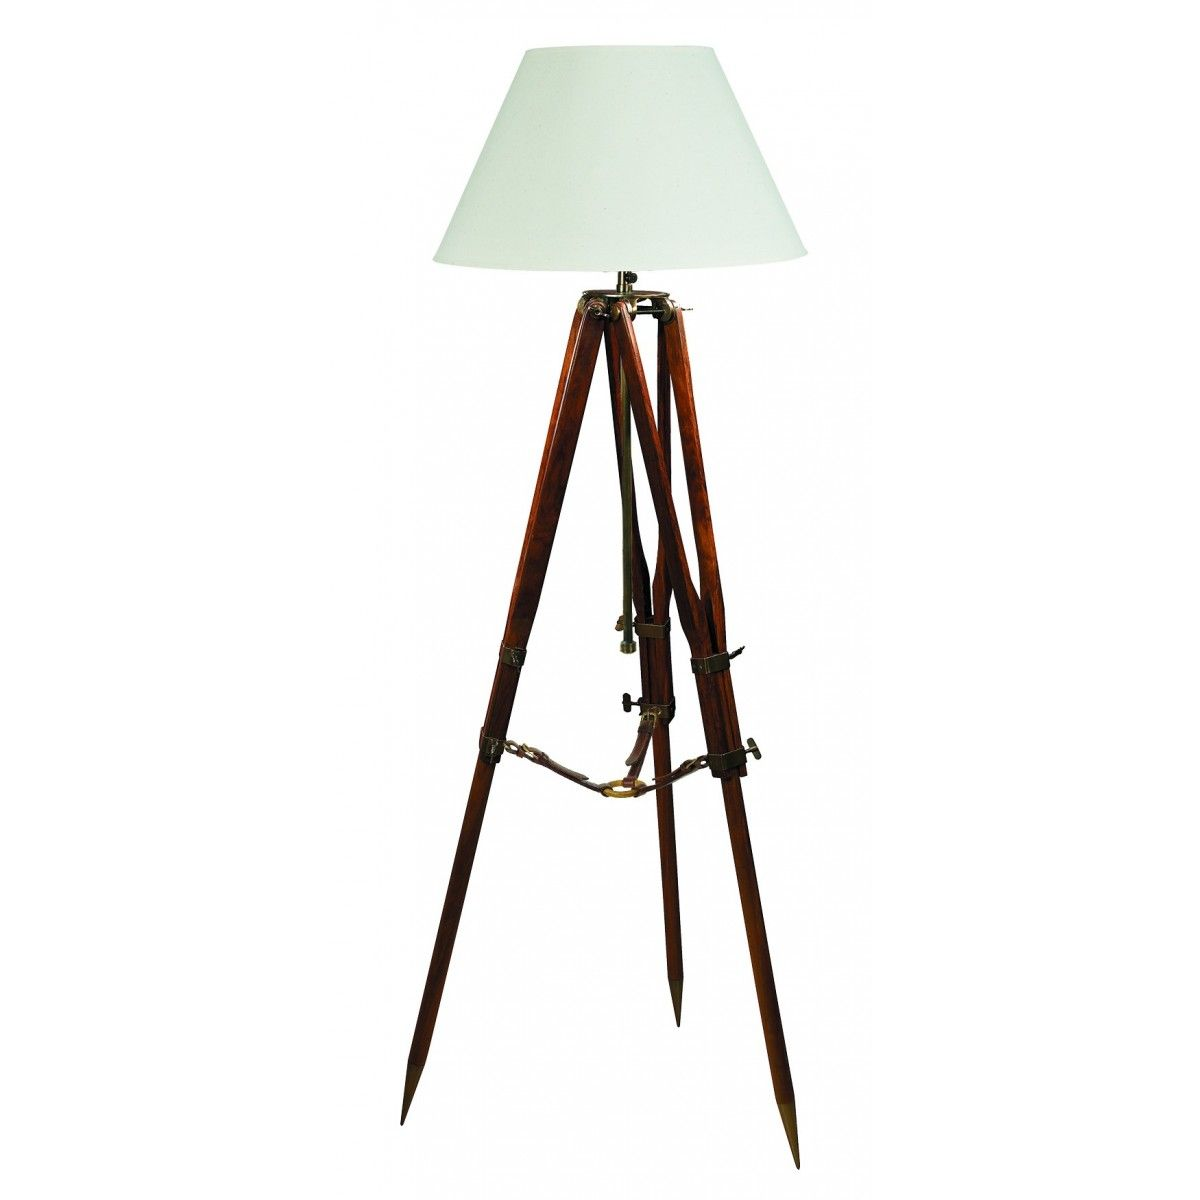 Campaign Tripod Lamp Wit Sl019 Tripod Lamp Vloerlamp Lampen